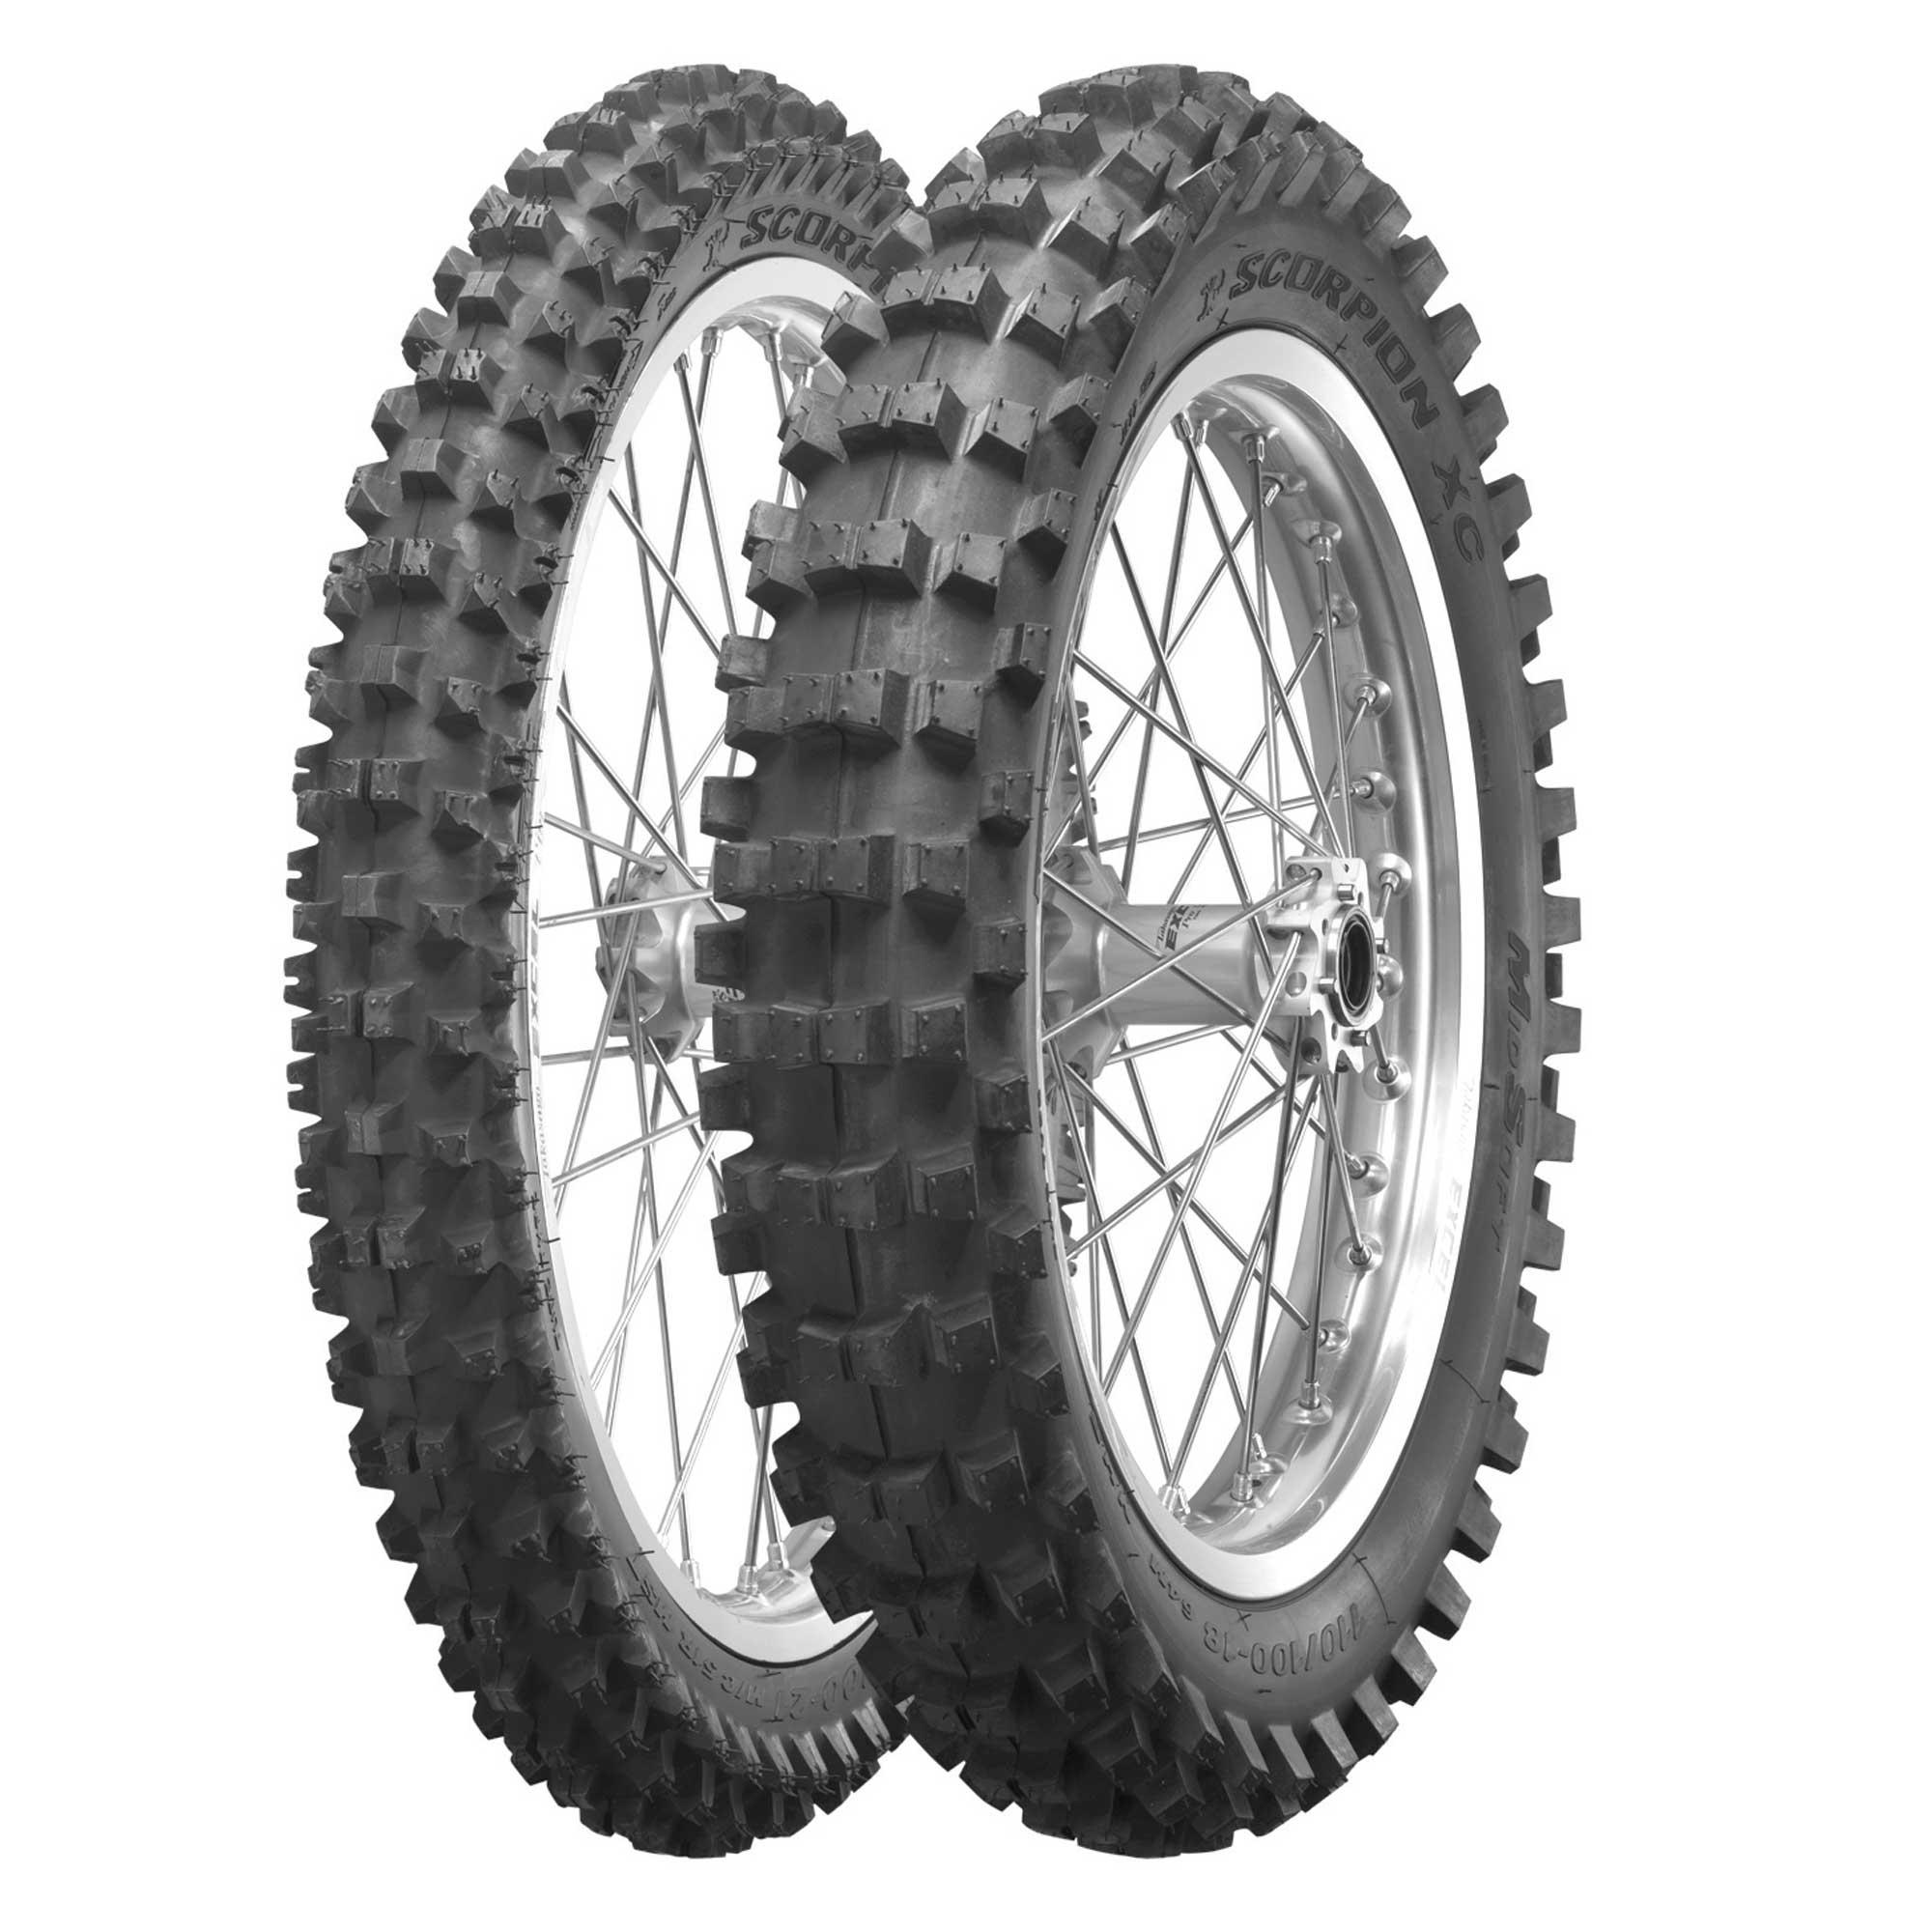 Pirelli / Scorpion XC Mid Soft